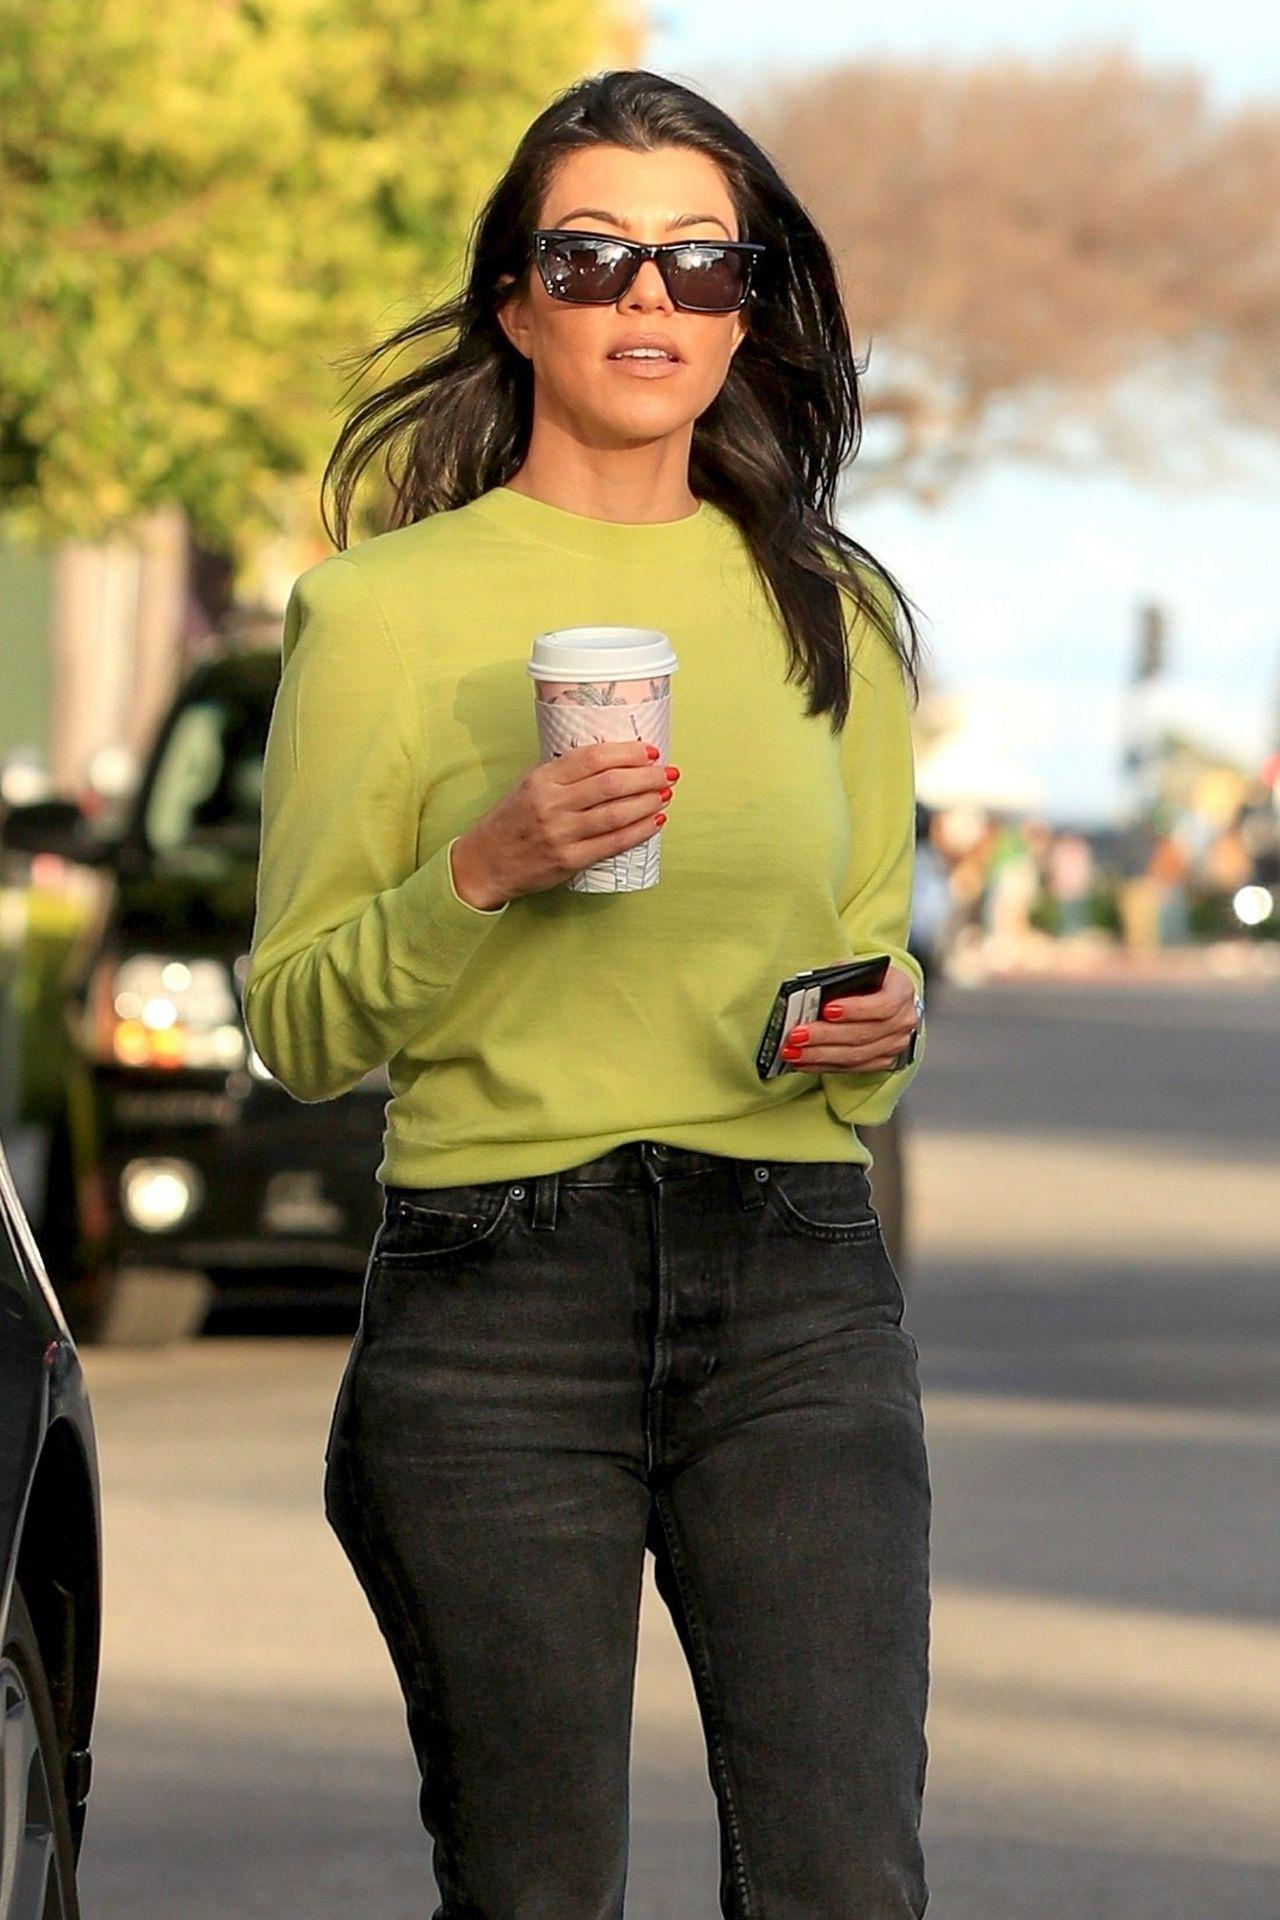 *EXCLUSIVE* Kourtney Kardashian goes on coffee run with friend shining in neon sweatshirt Kourtney Kardashian